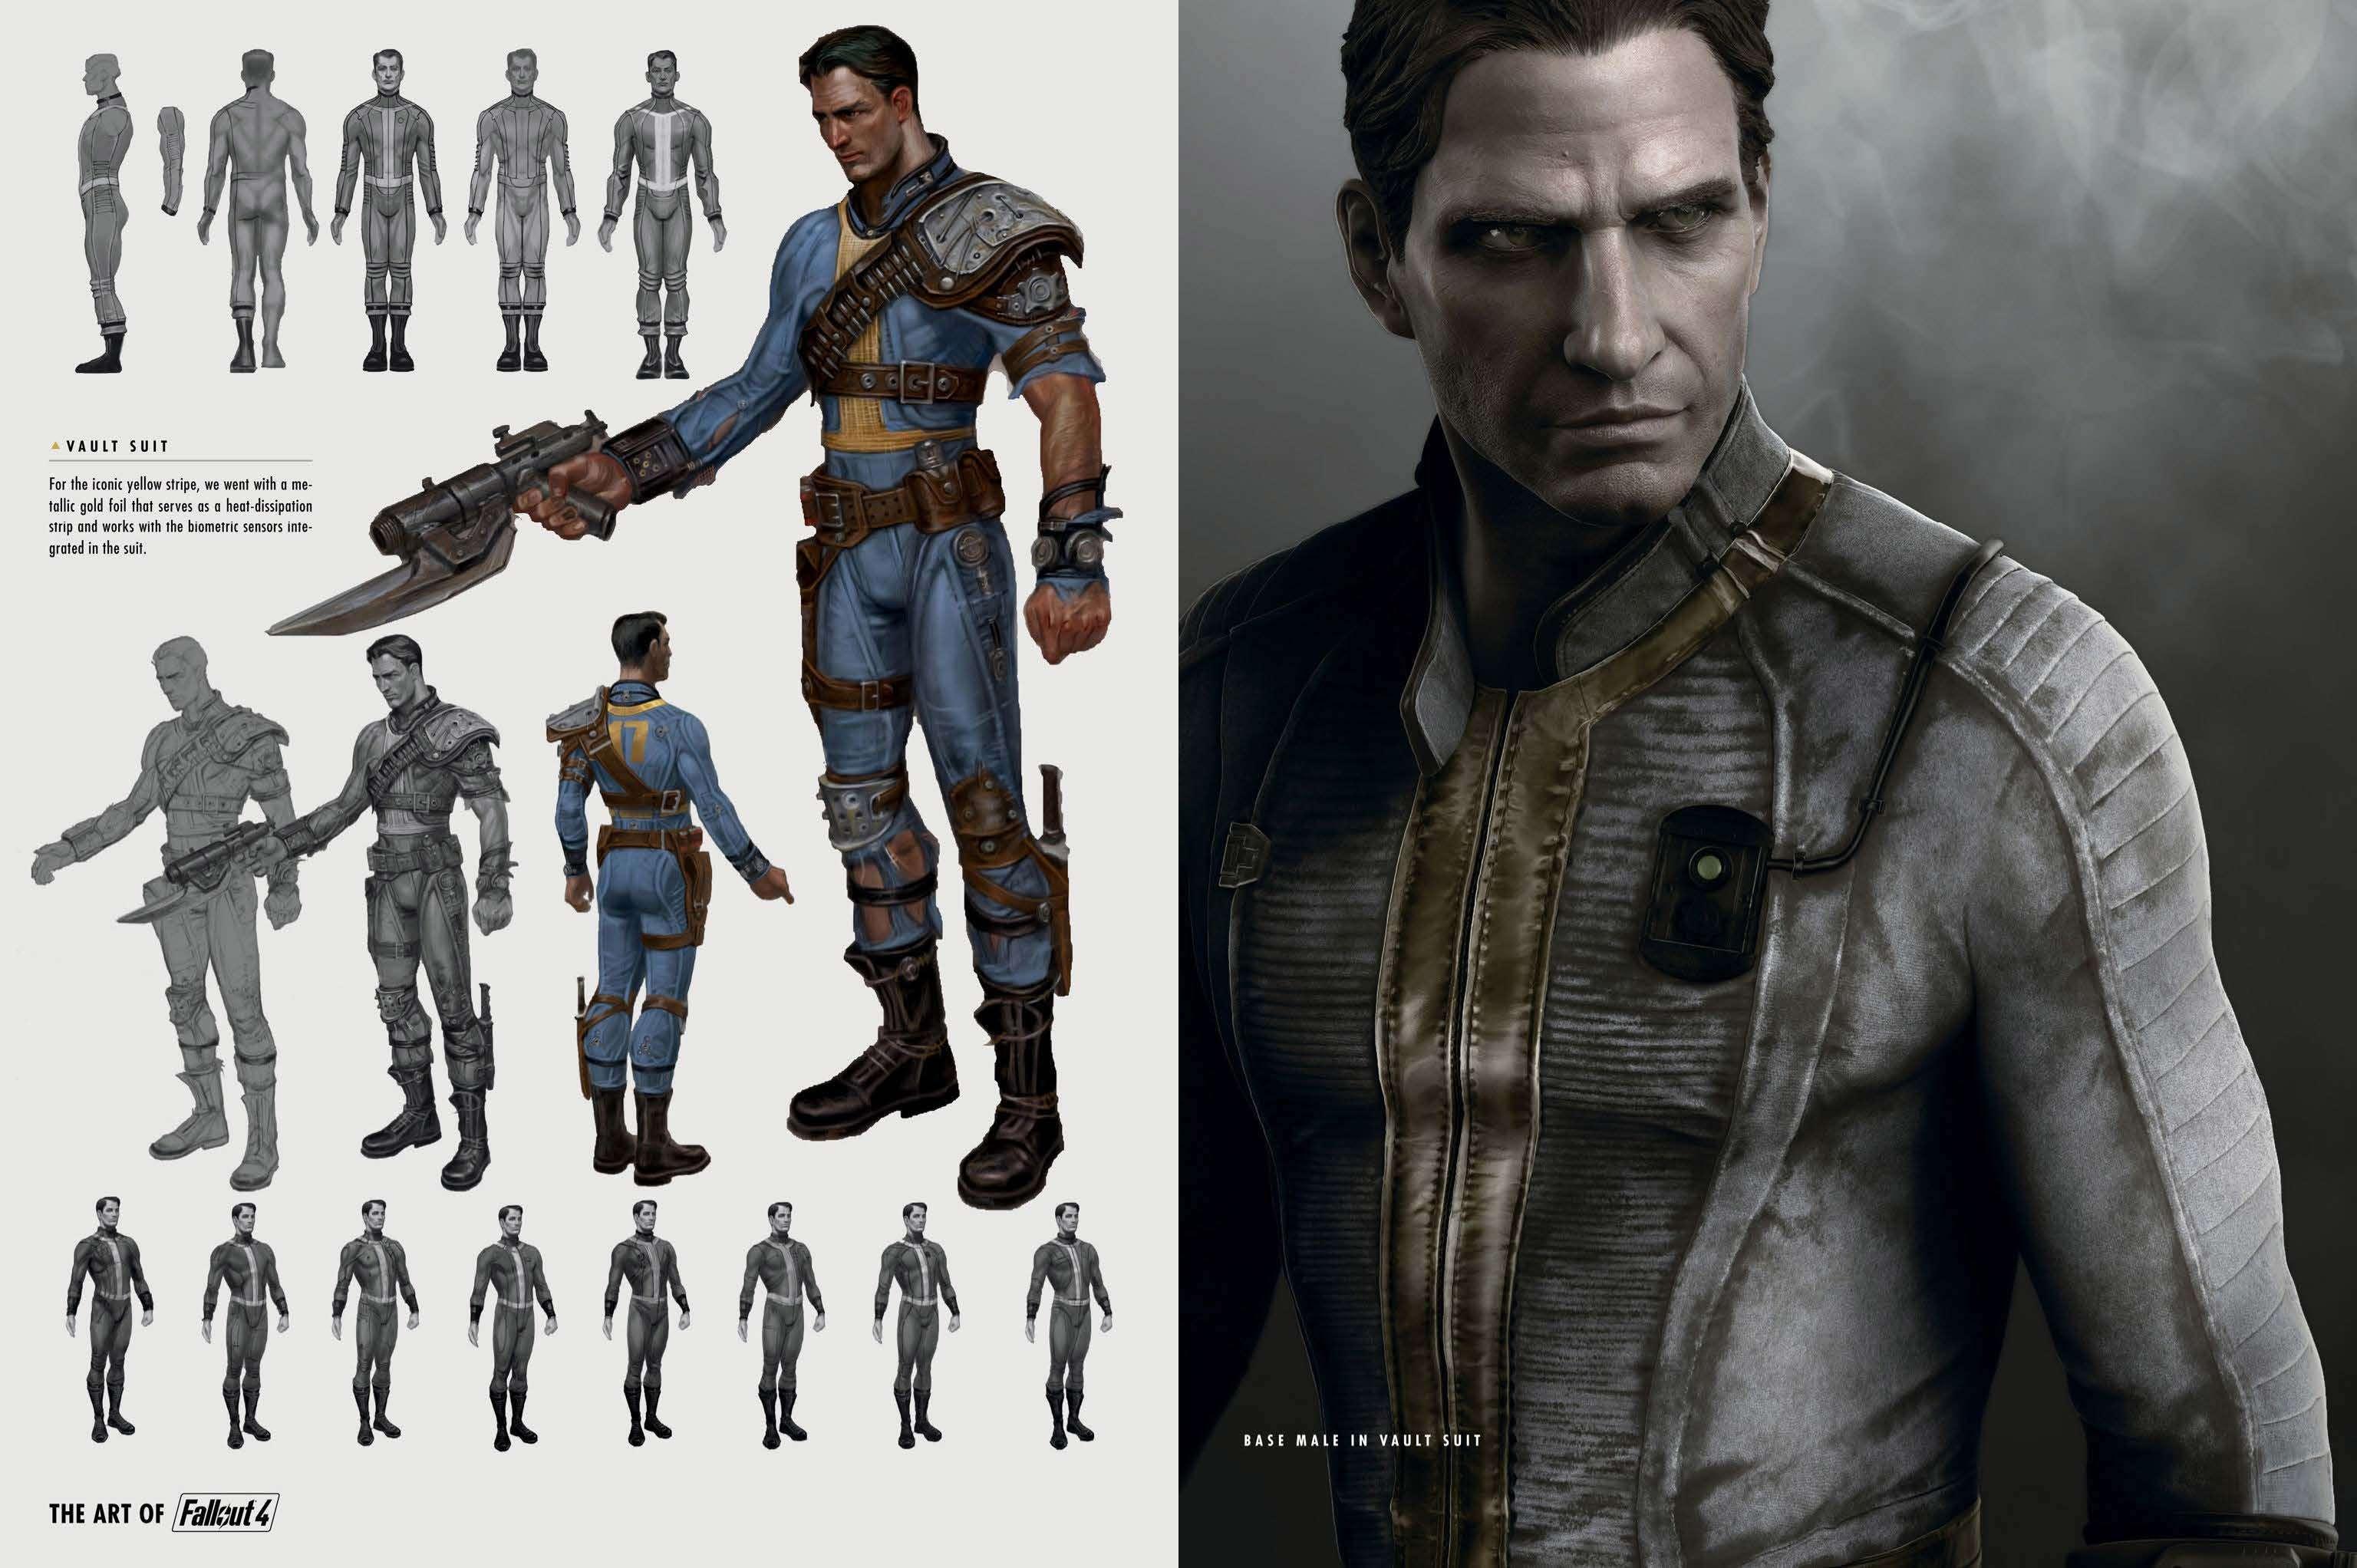 The Art of Fallout 4 - # 009 - Fallout 4 Артбук